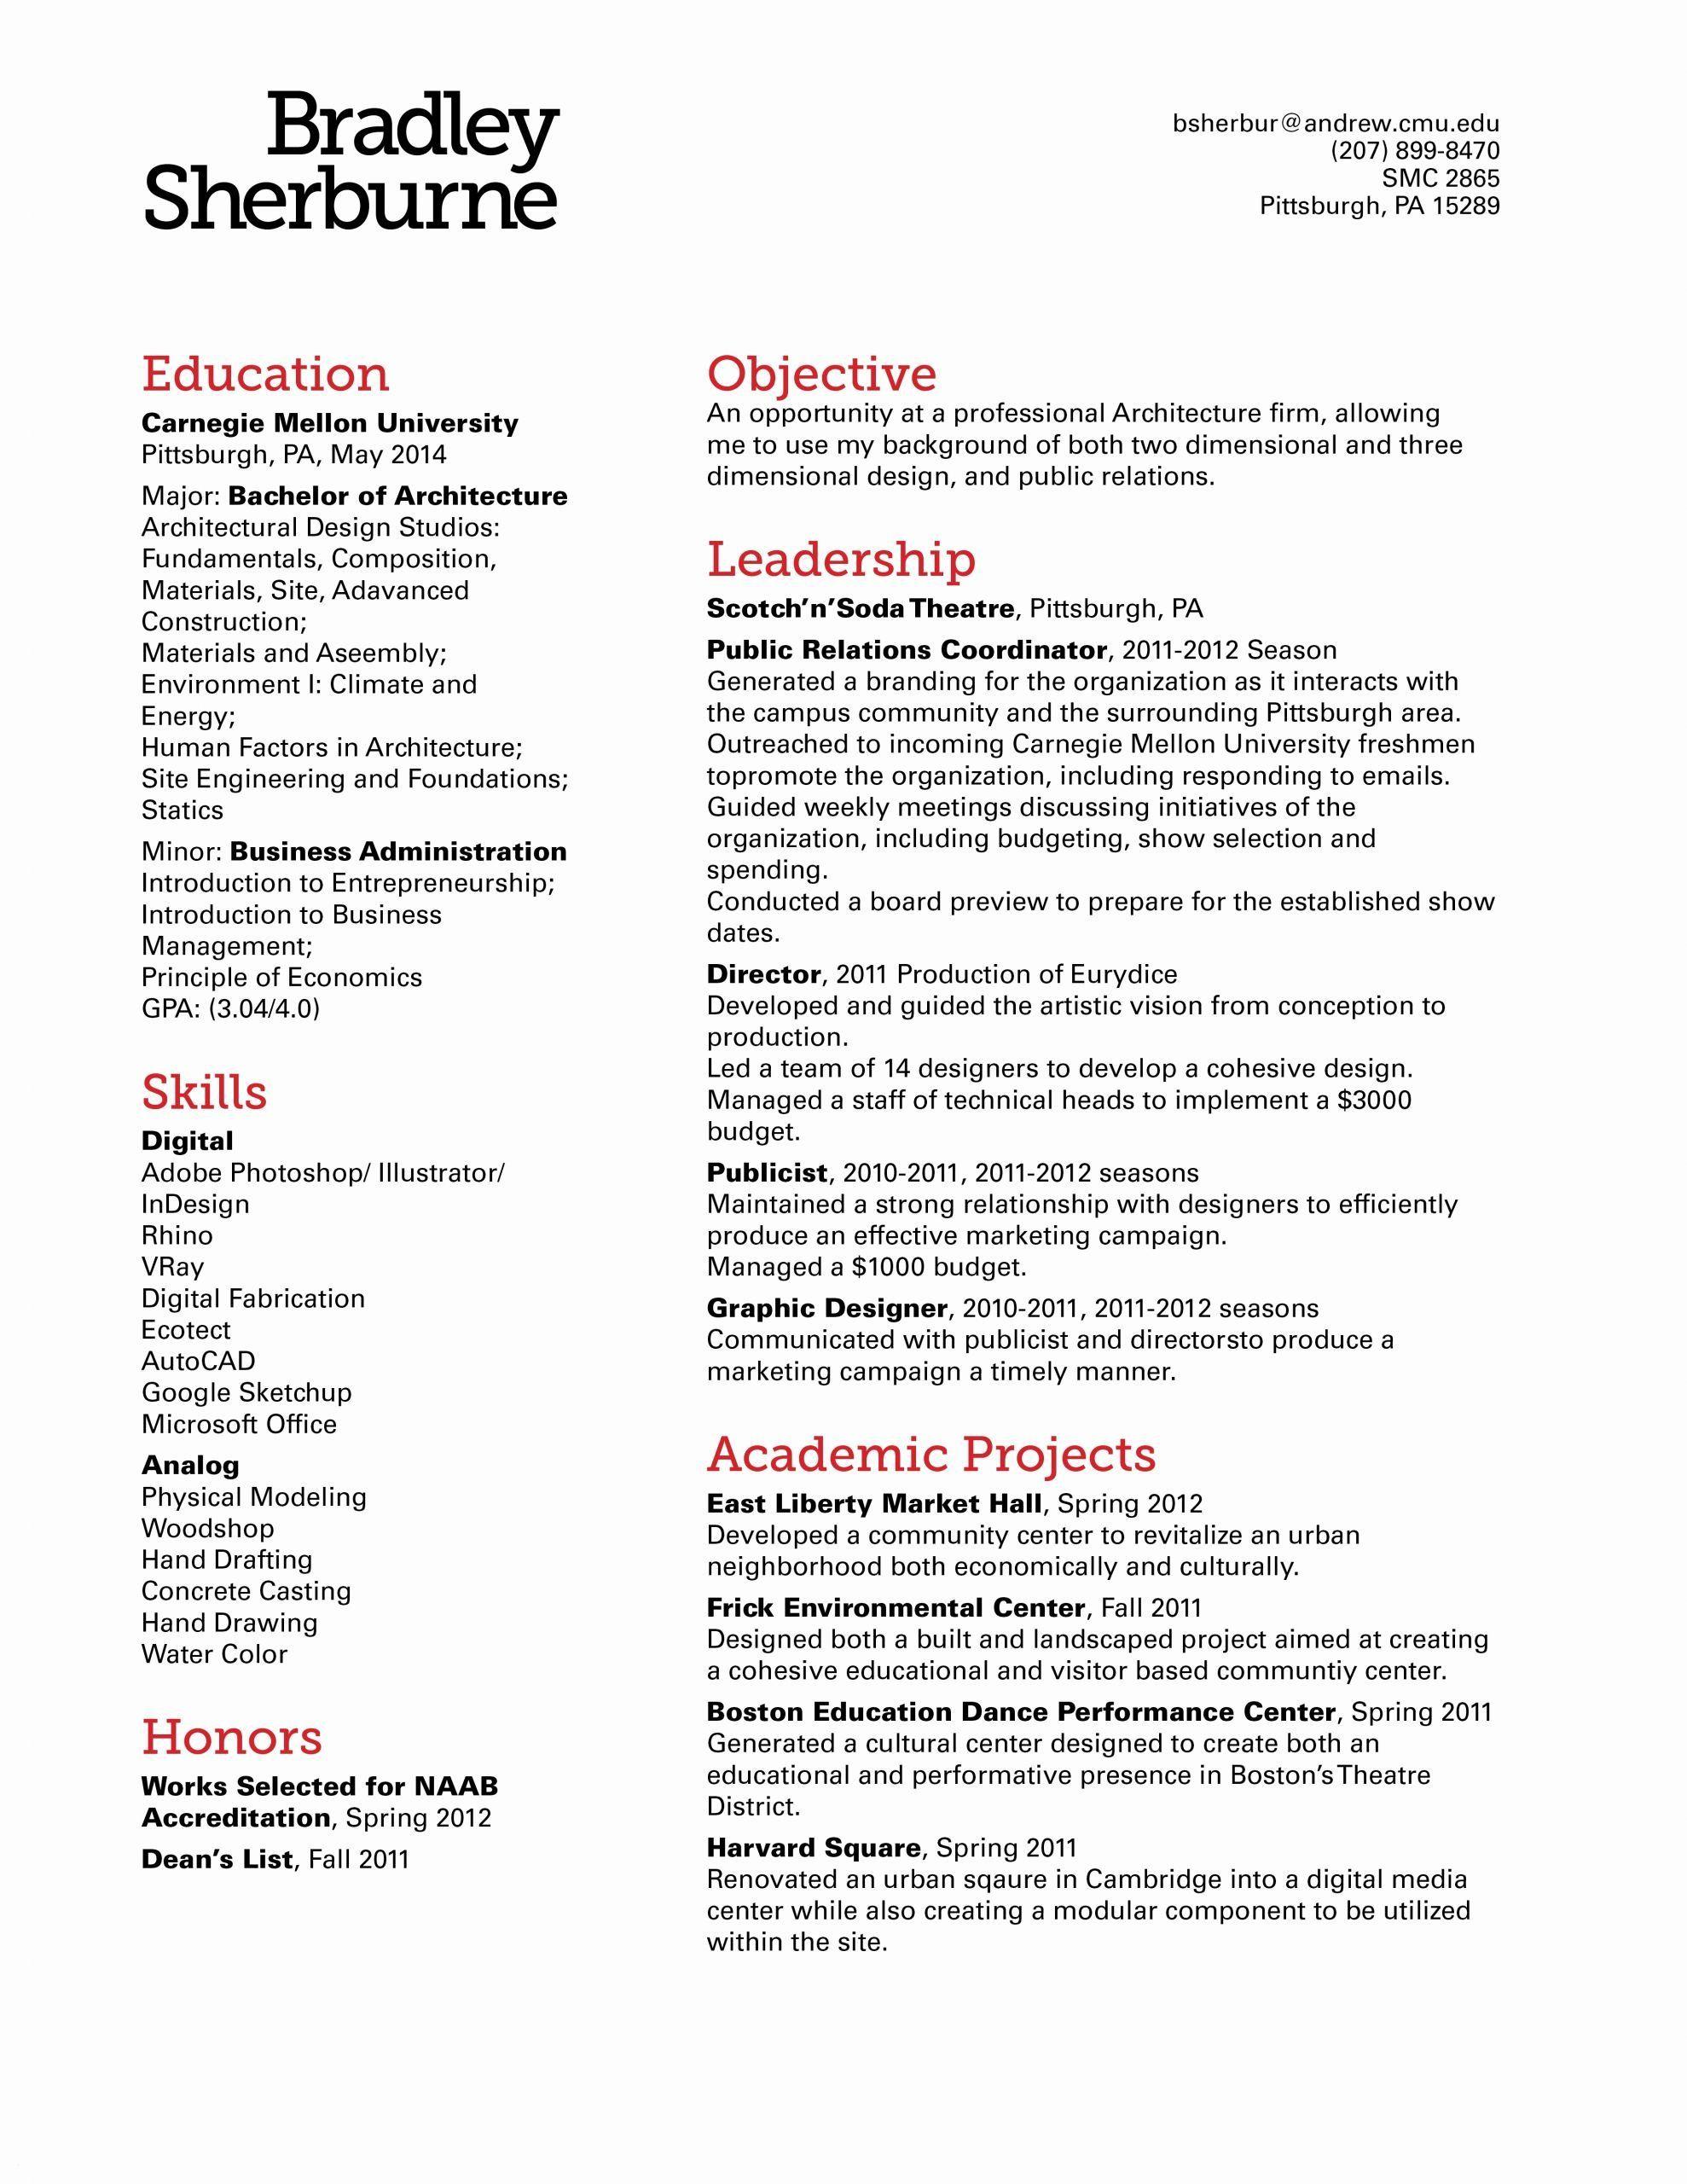 2 Column Resume Format Resume Templates Resume Template Word Resume Format Resume Template